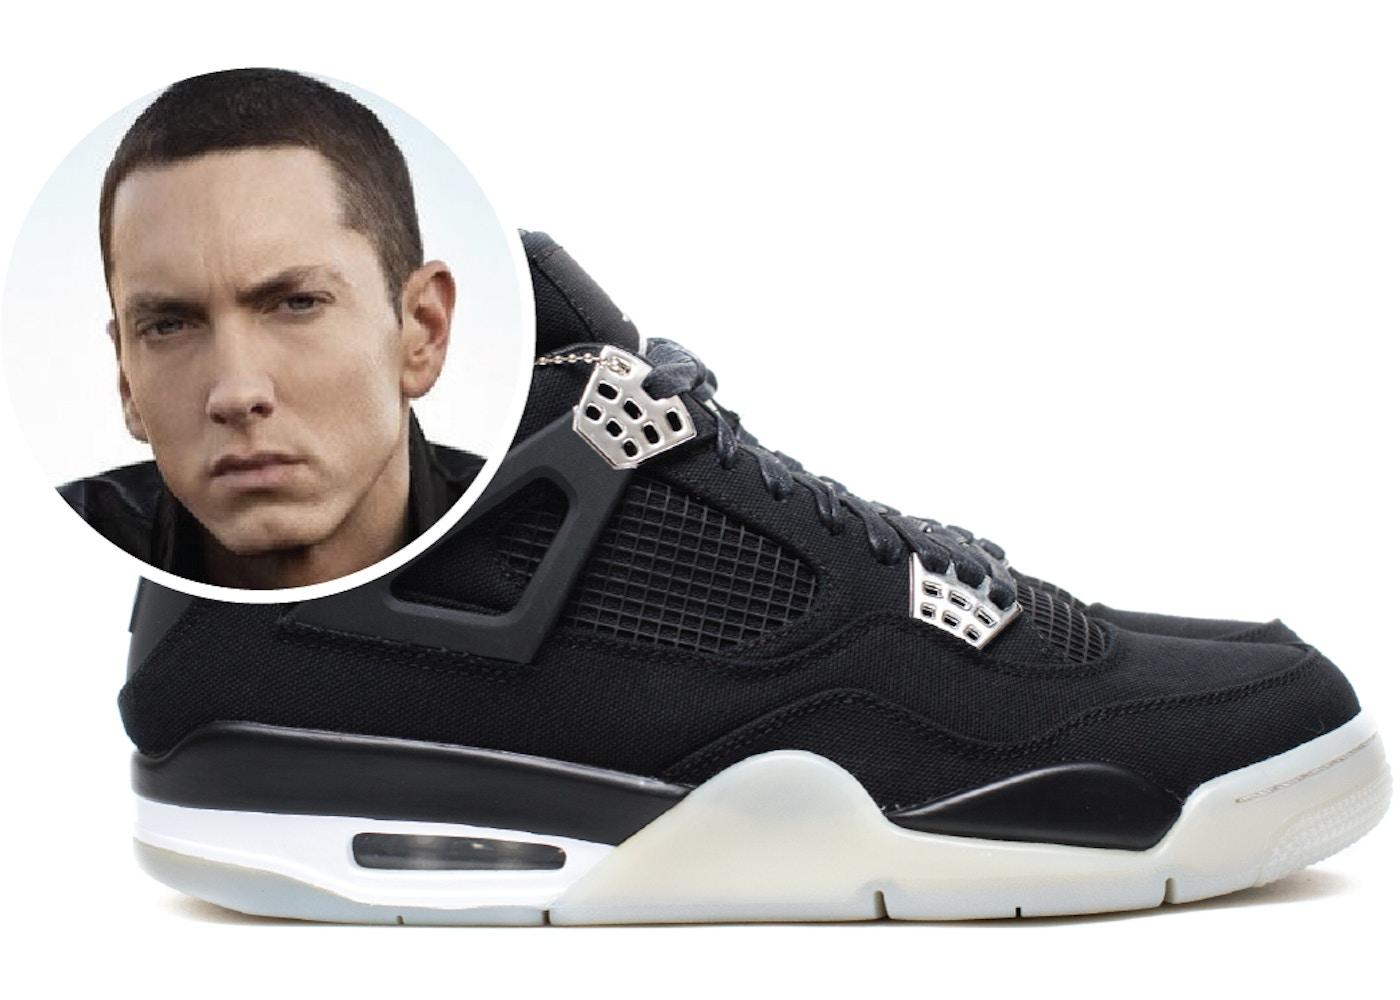 2cbe5e7384e Jordan 4 Retro Eminem Carhartt Signed Box (sz 10.5)